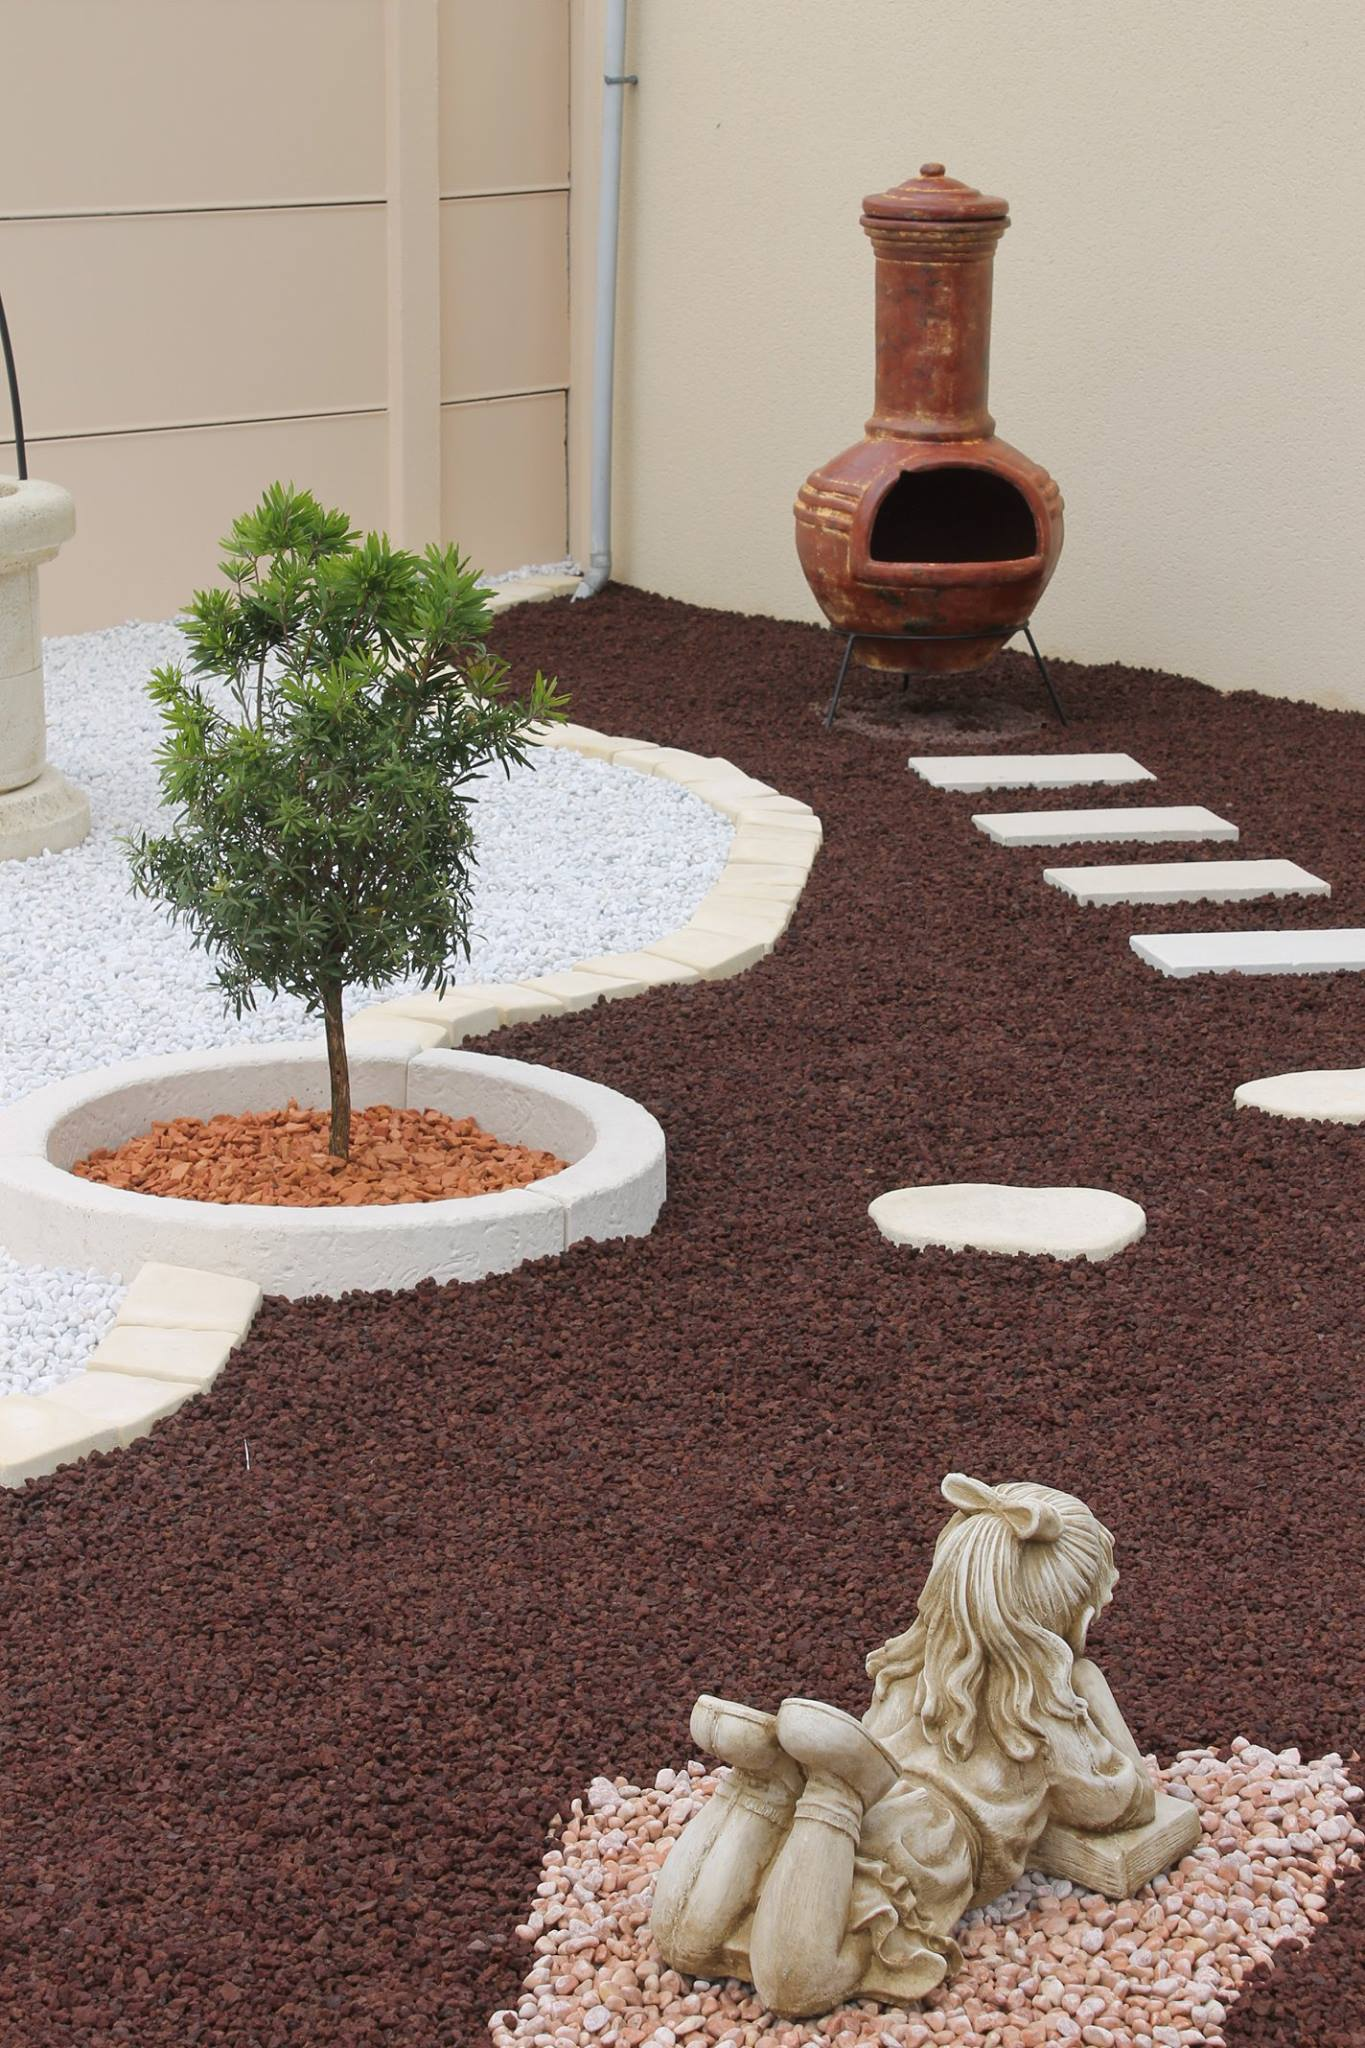 trouver une idee deco jardin aublet fabricant moulin de jardin d co aublet d coration jardin. Black Bedroom Furniture Sets. Home Design Ideas